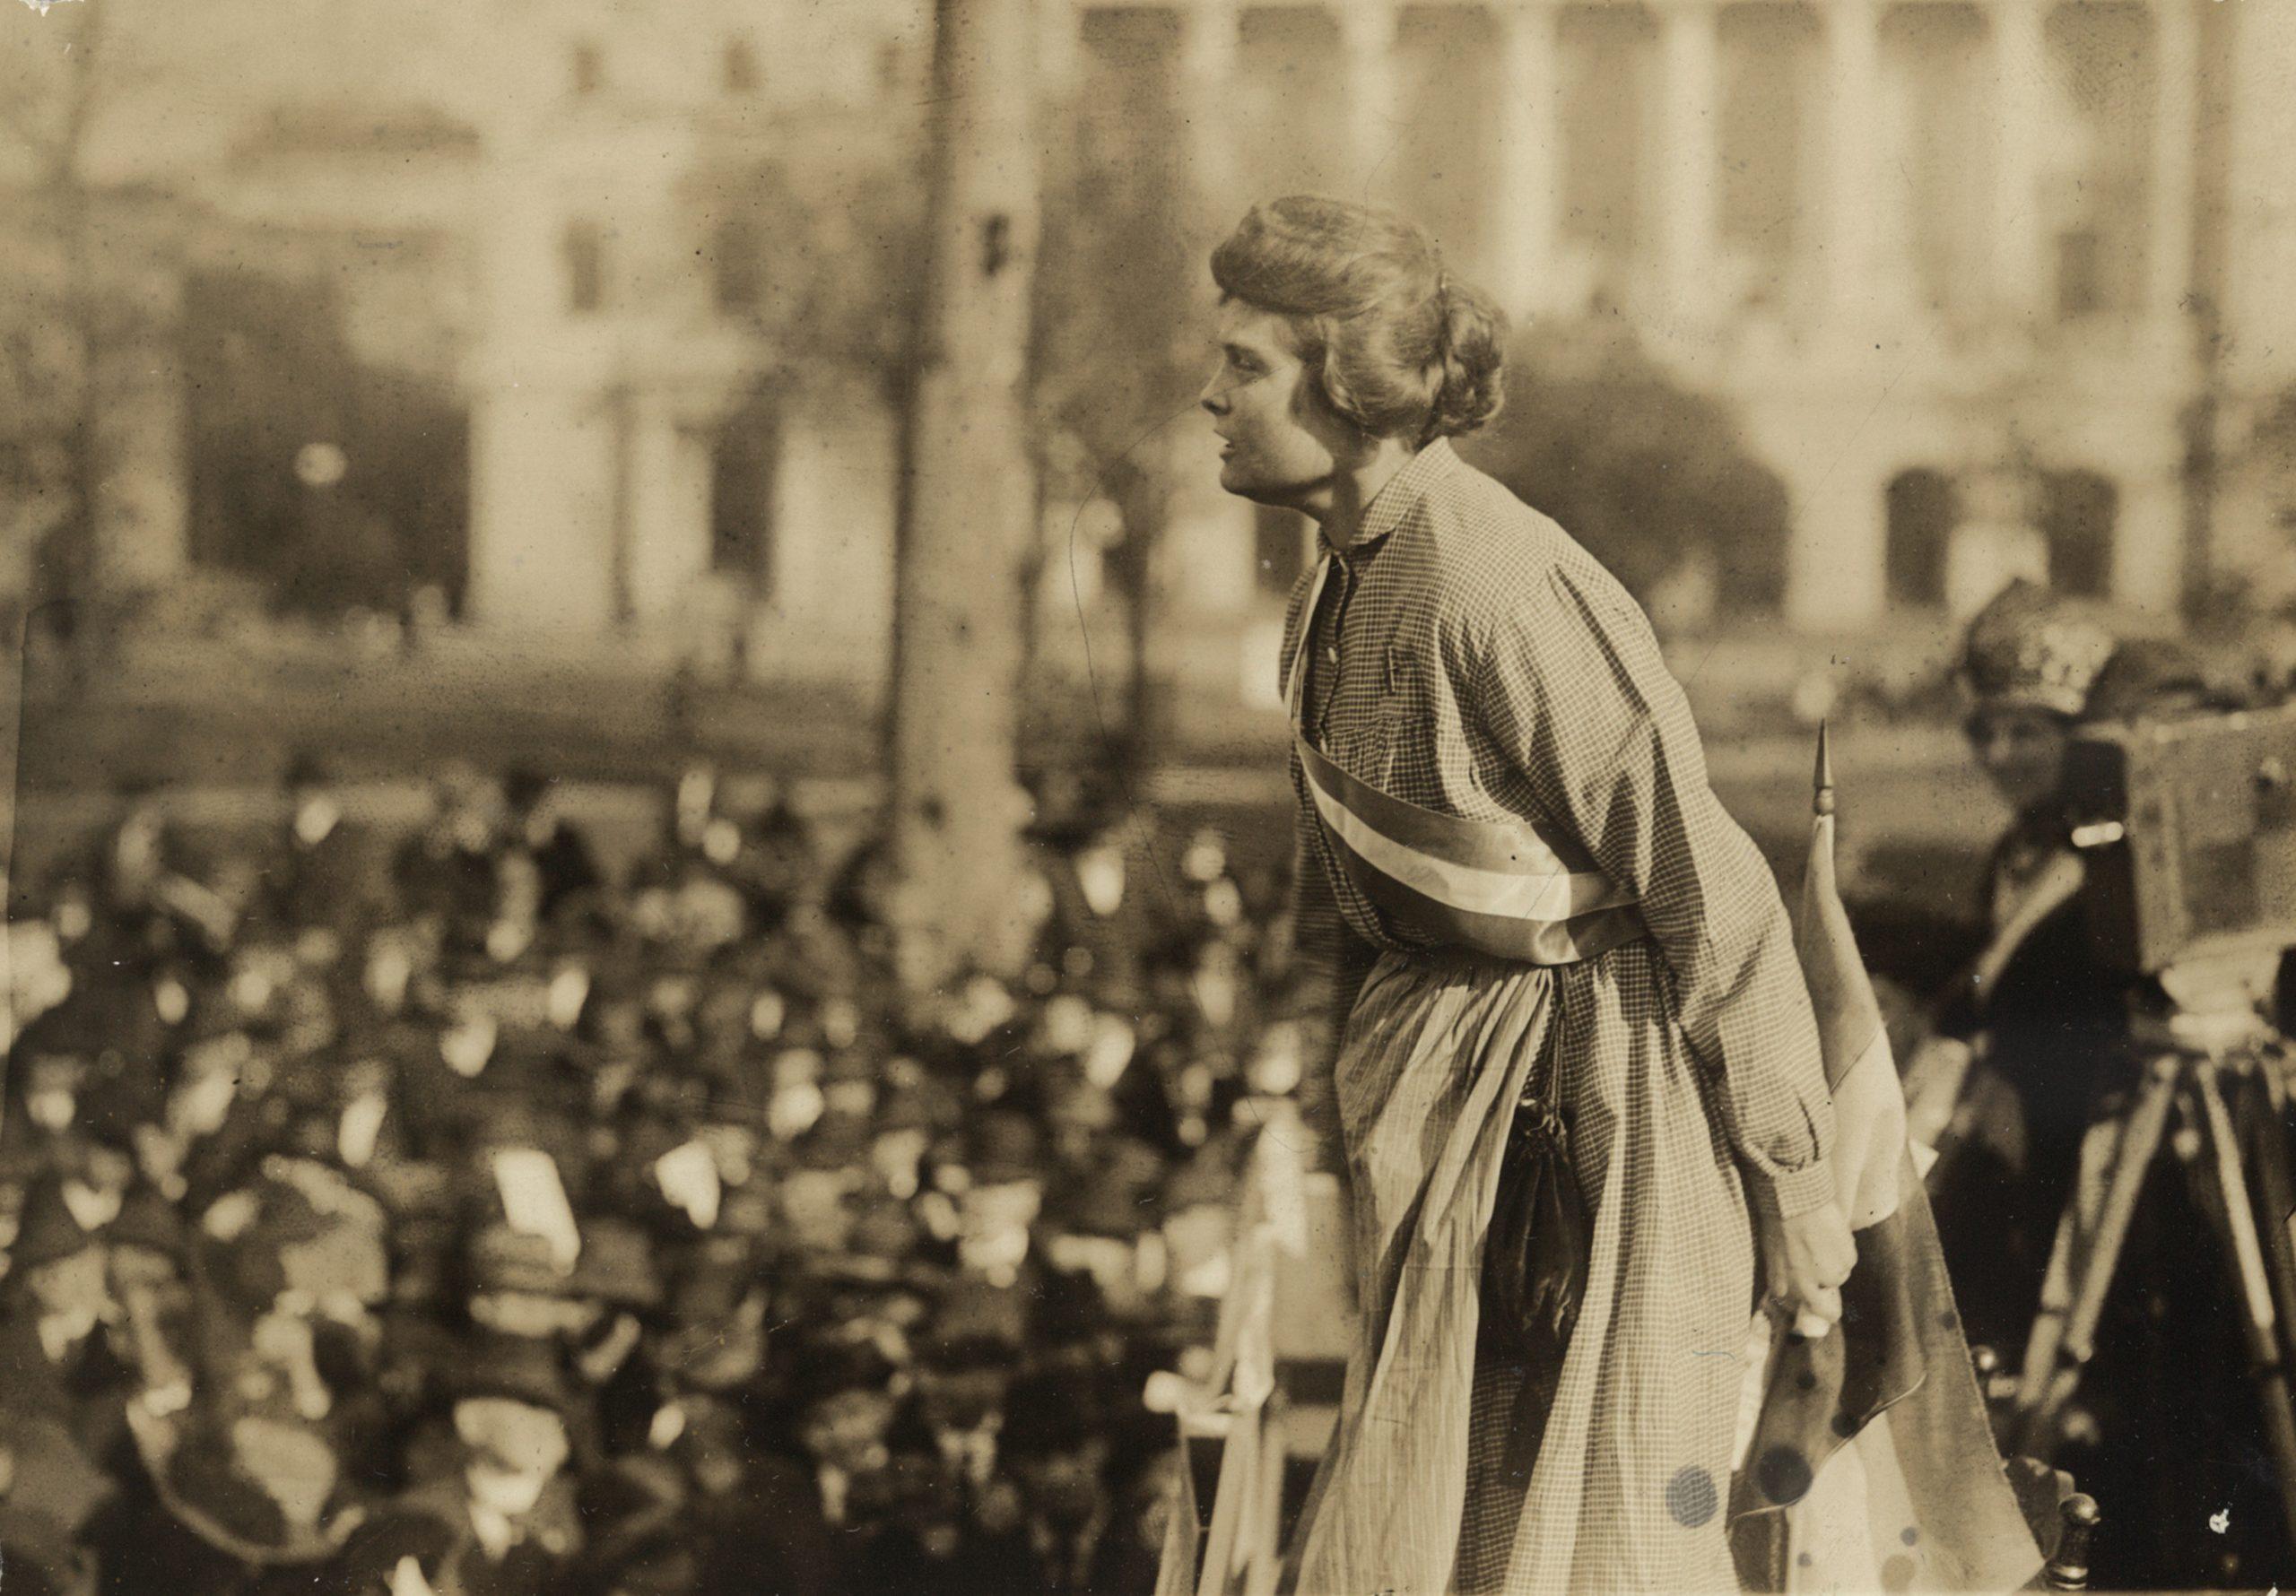 Formerly Imprisoned Suffragist on Speaking Tour